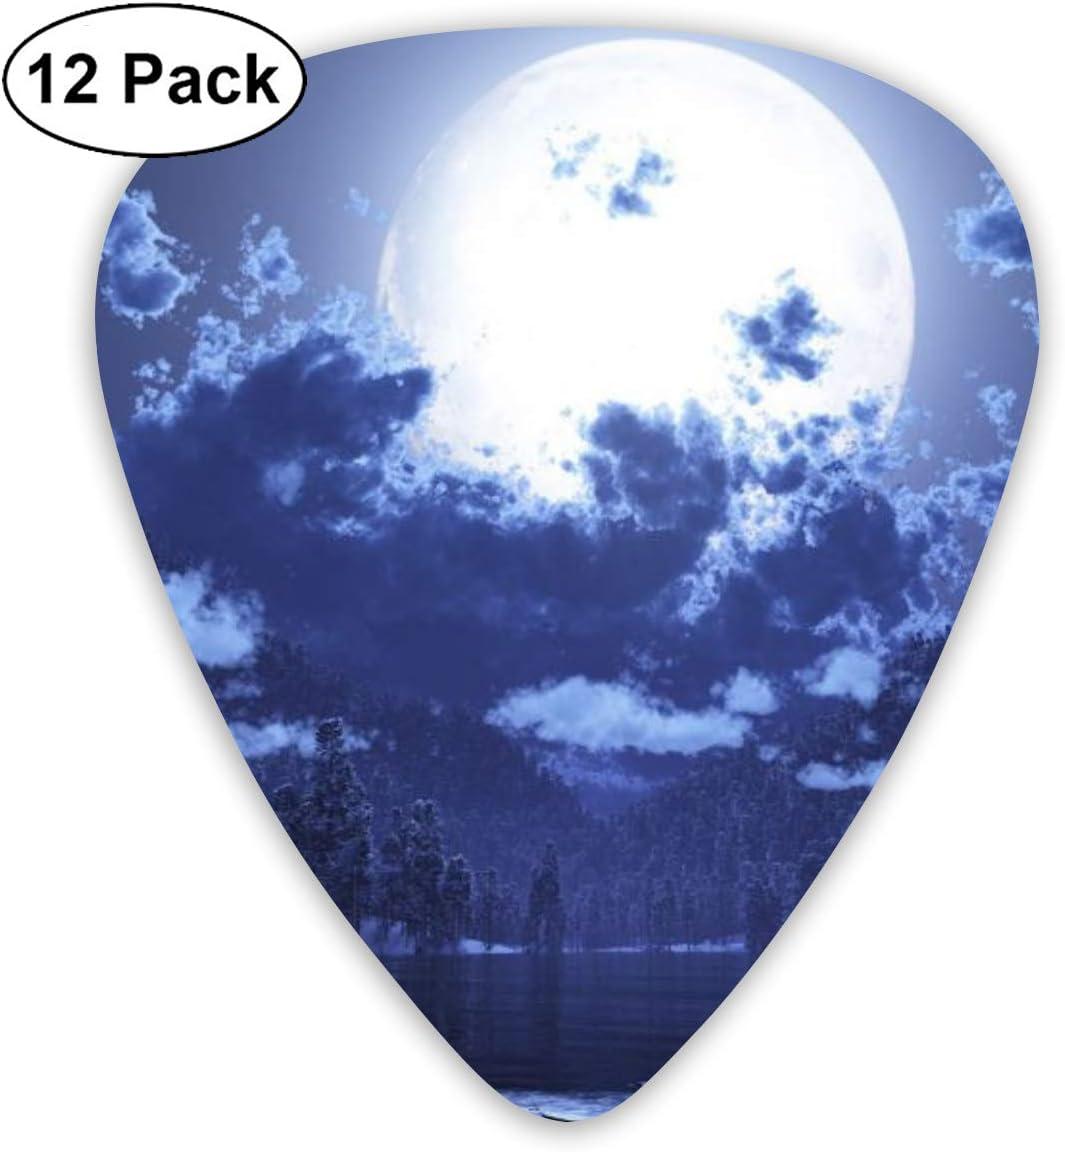 12 Pack Guitar Picks Plectrums With Picks Holder Moon Lake Forest Celluloid Guitar Pick Set For Acoustic Electric Guitar Bass Mandolin Ukulele 0.46mm 0.71mm 0.96mm